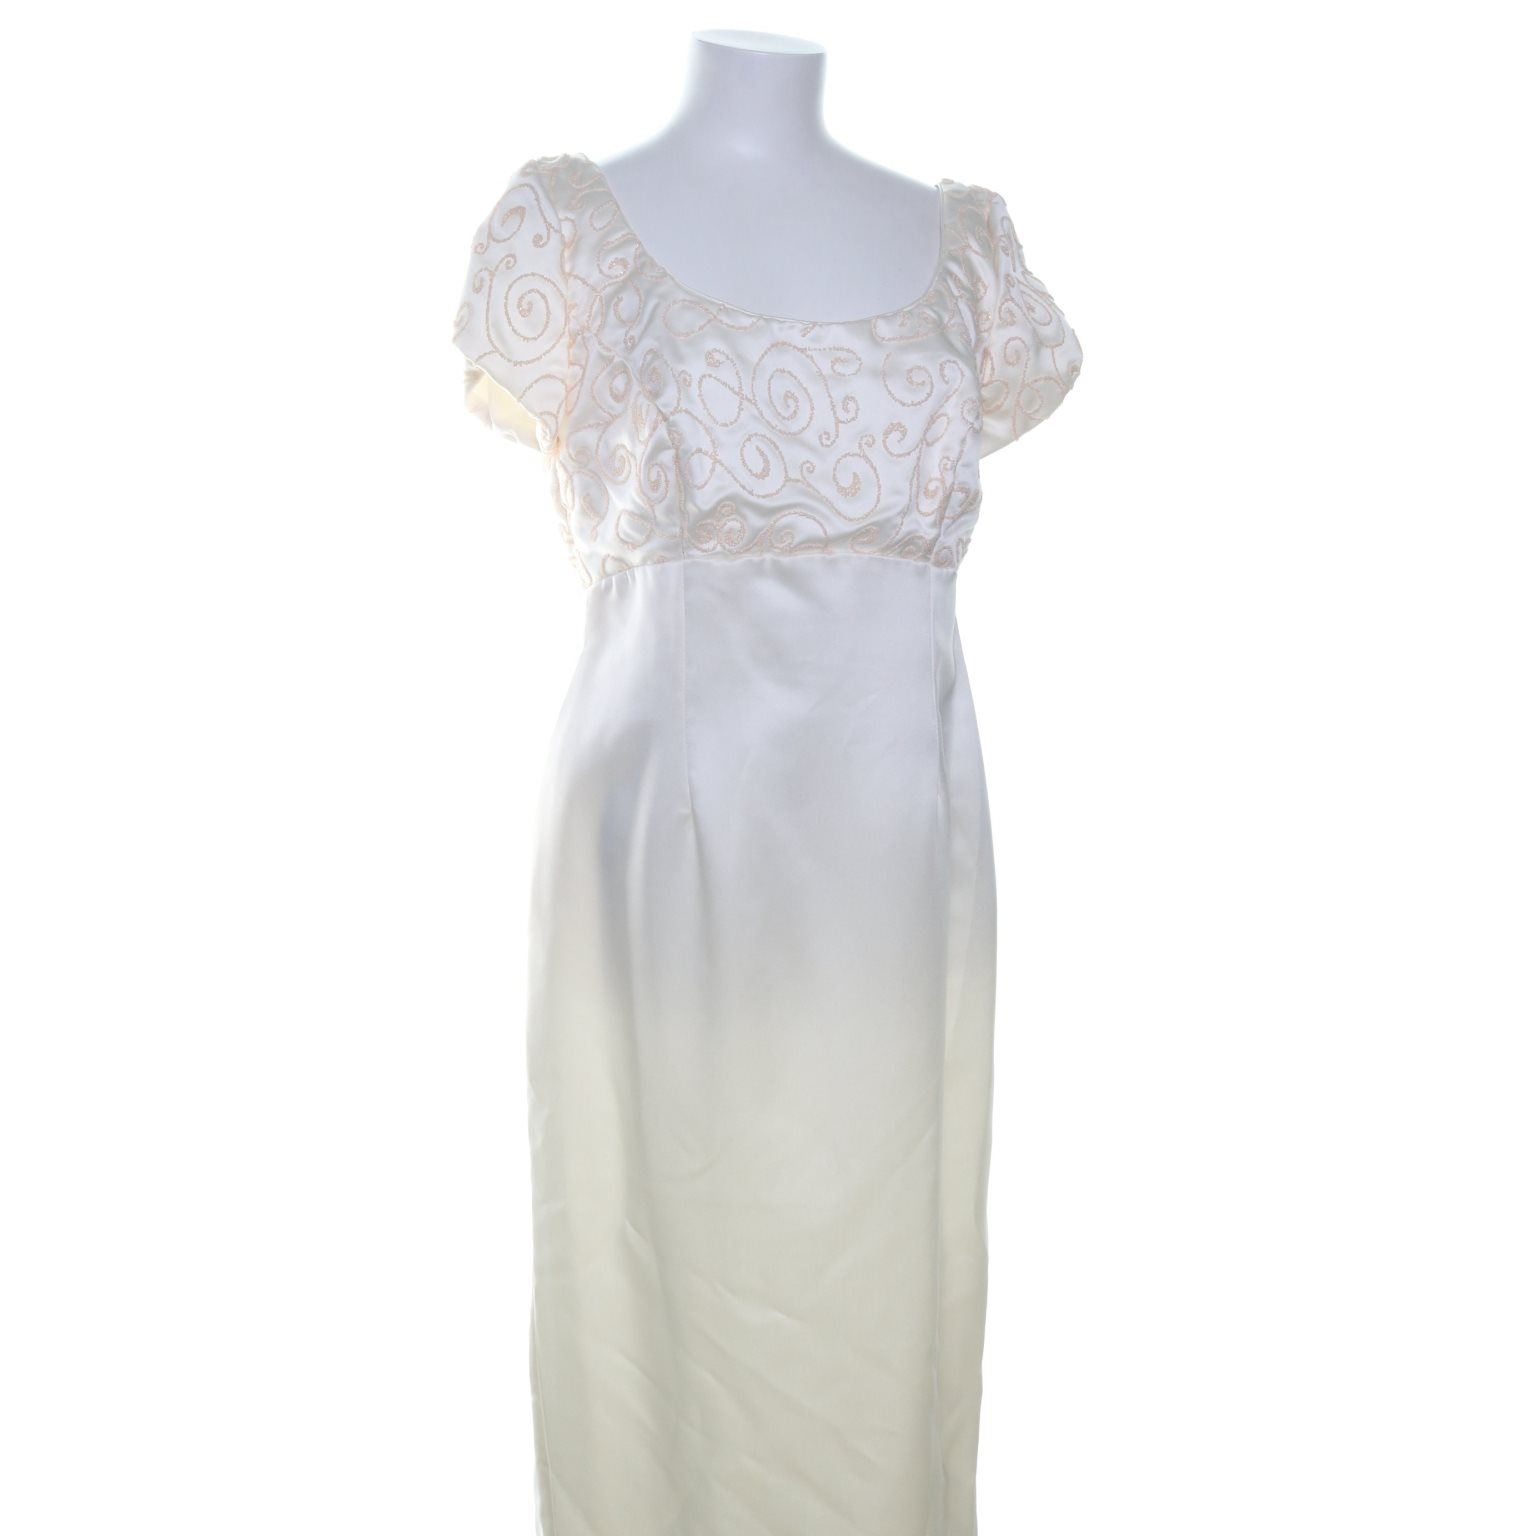 Brudklänning, Strl: 2XL, 1936, Beige/Vit